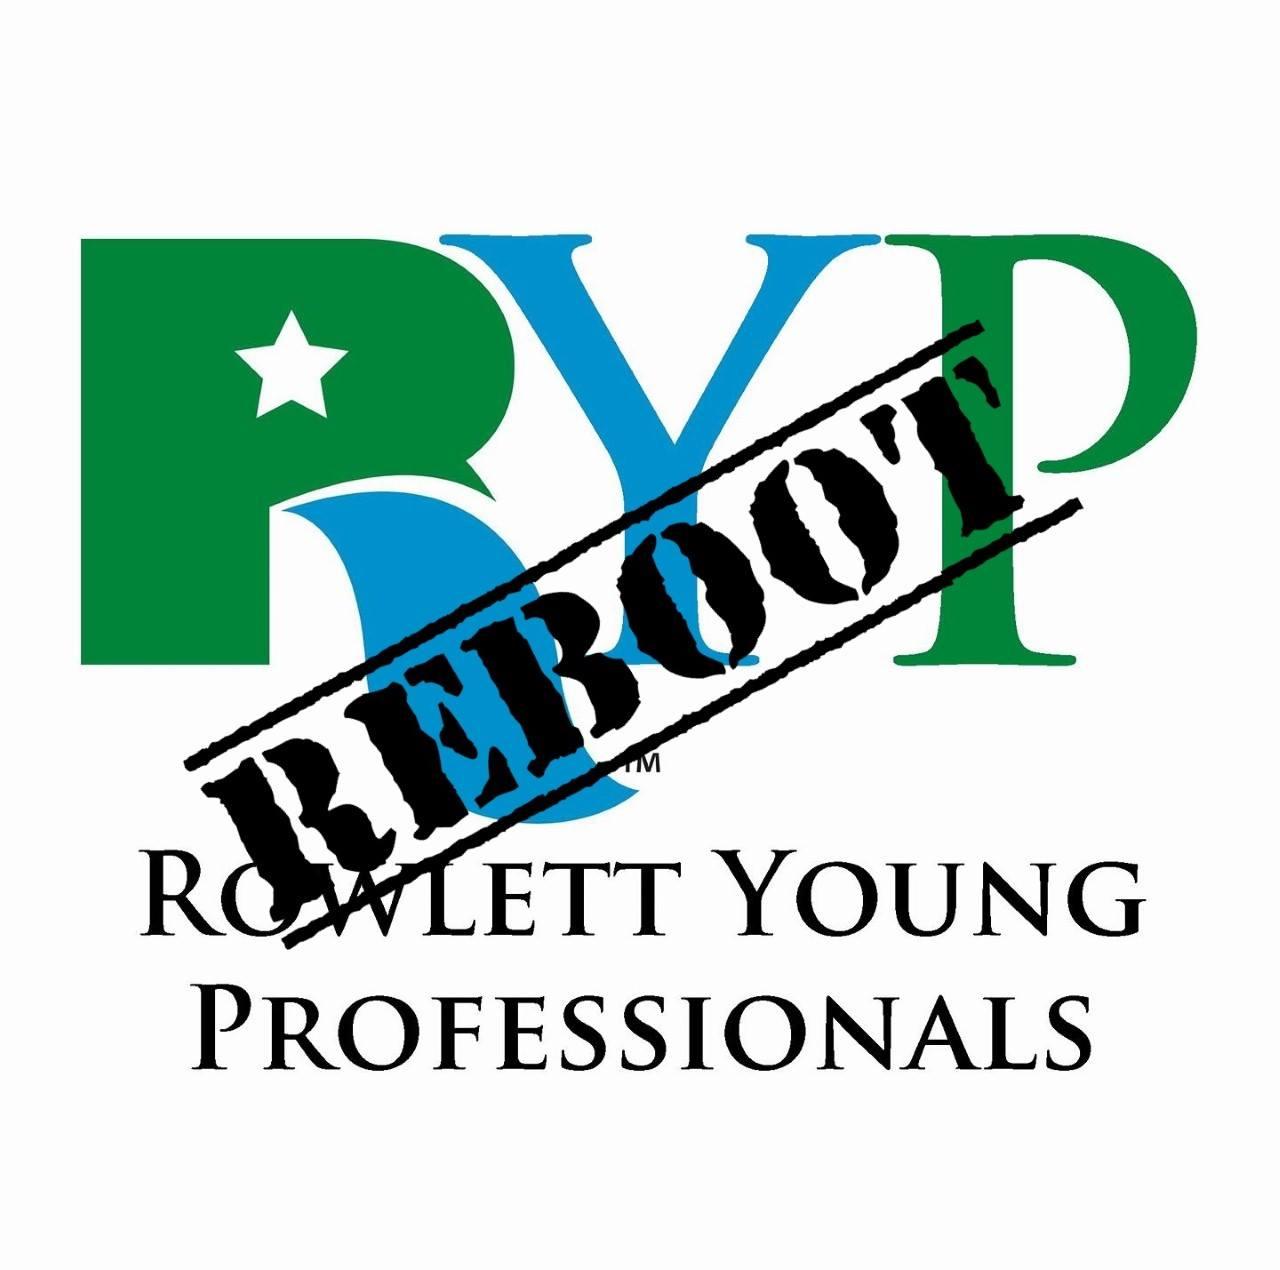 Rowlett Young Professionals Reboot